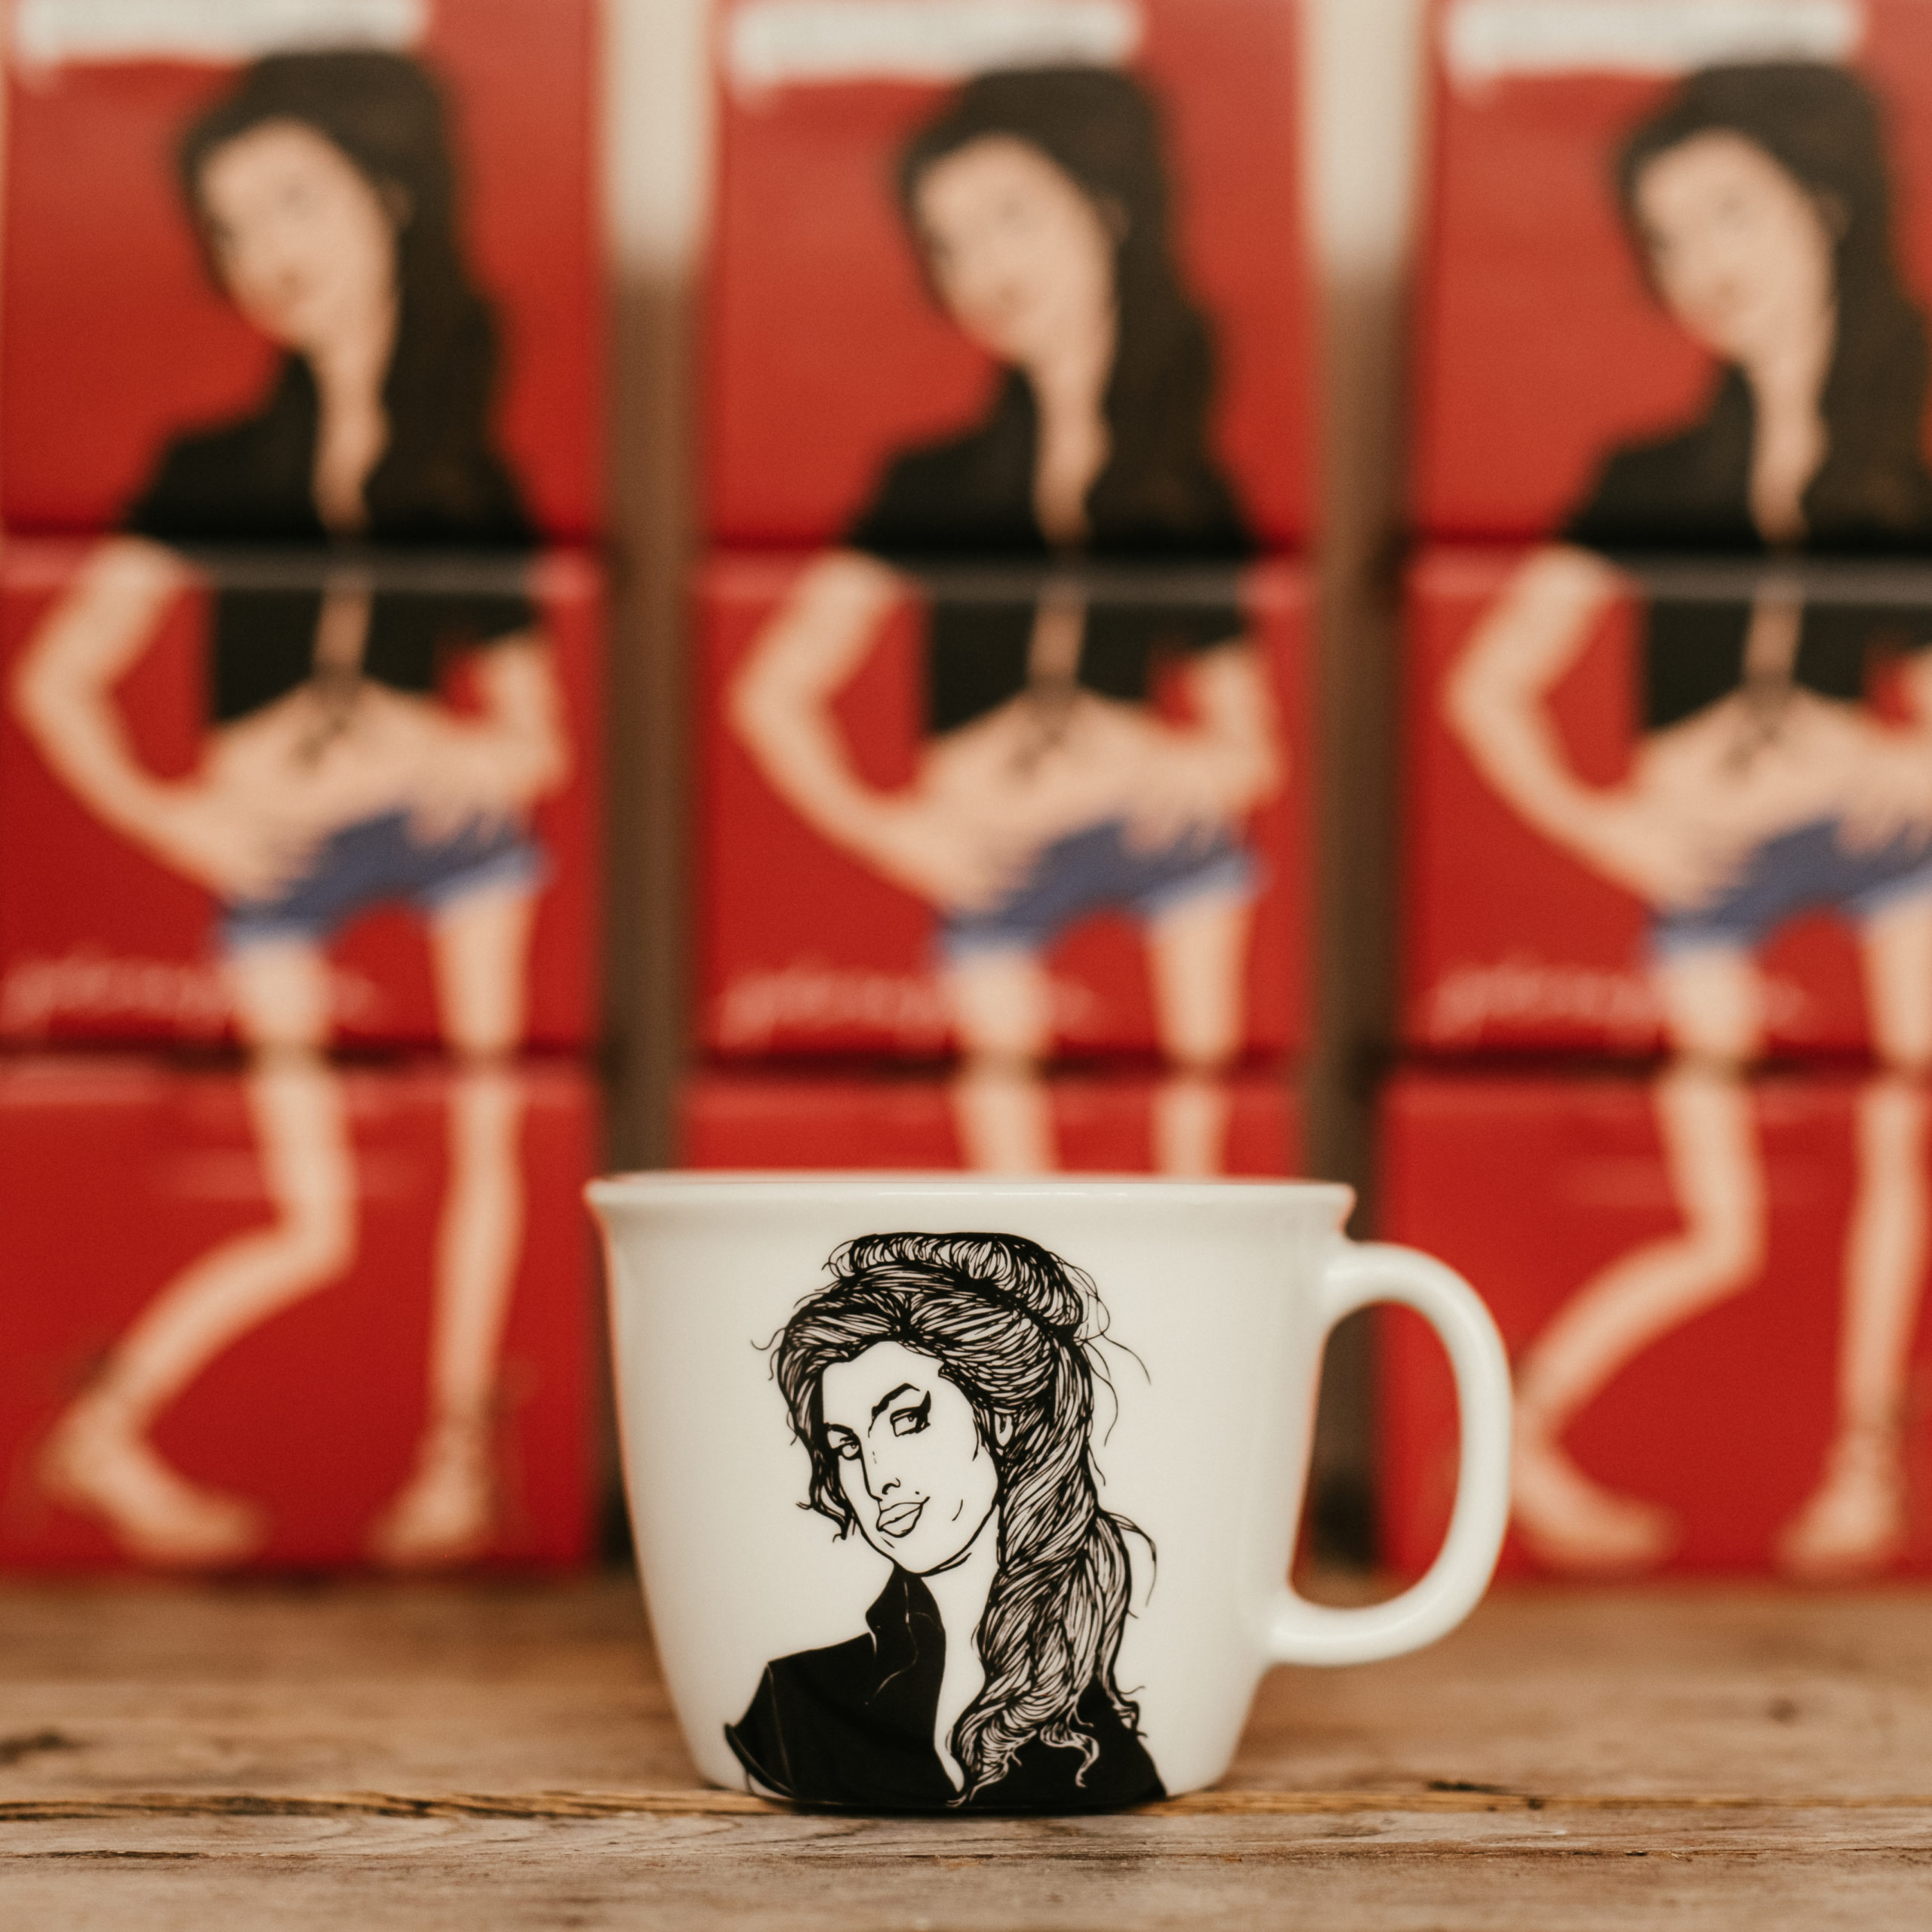 AMY, the muse, 35cl mug